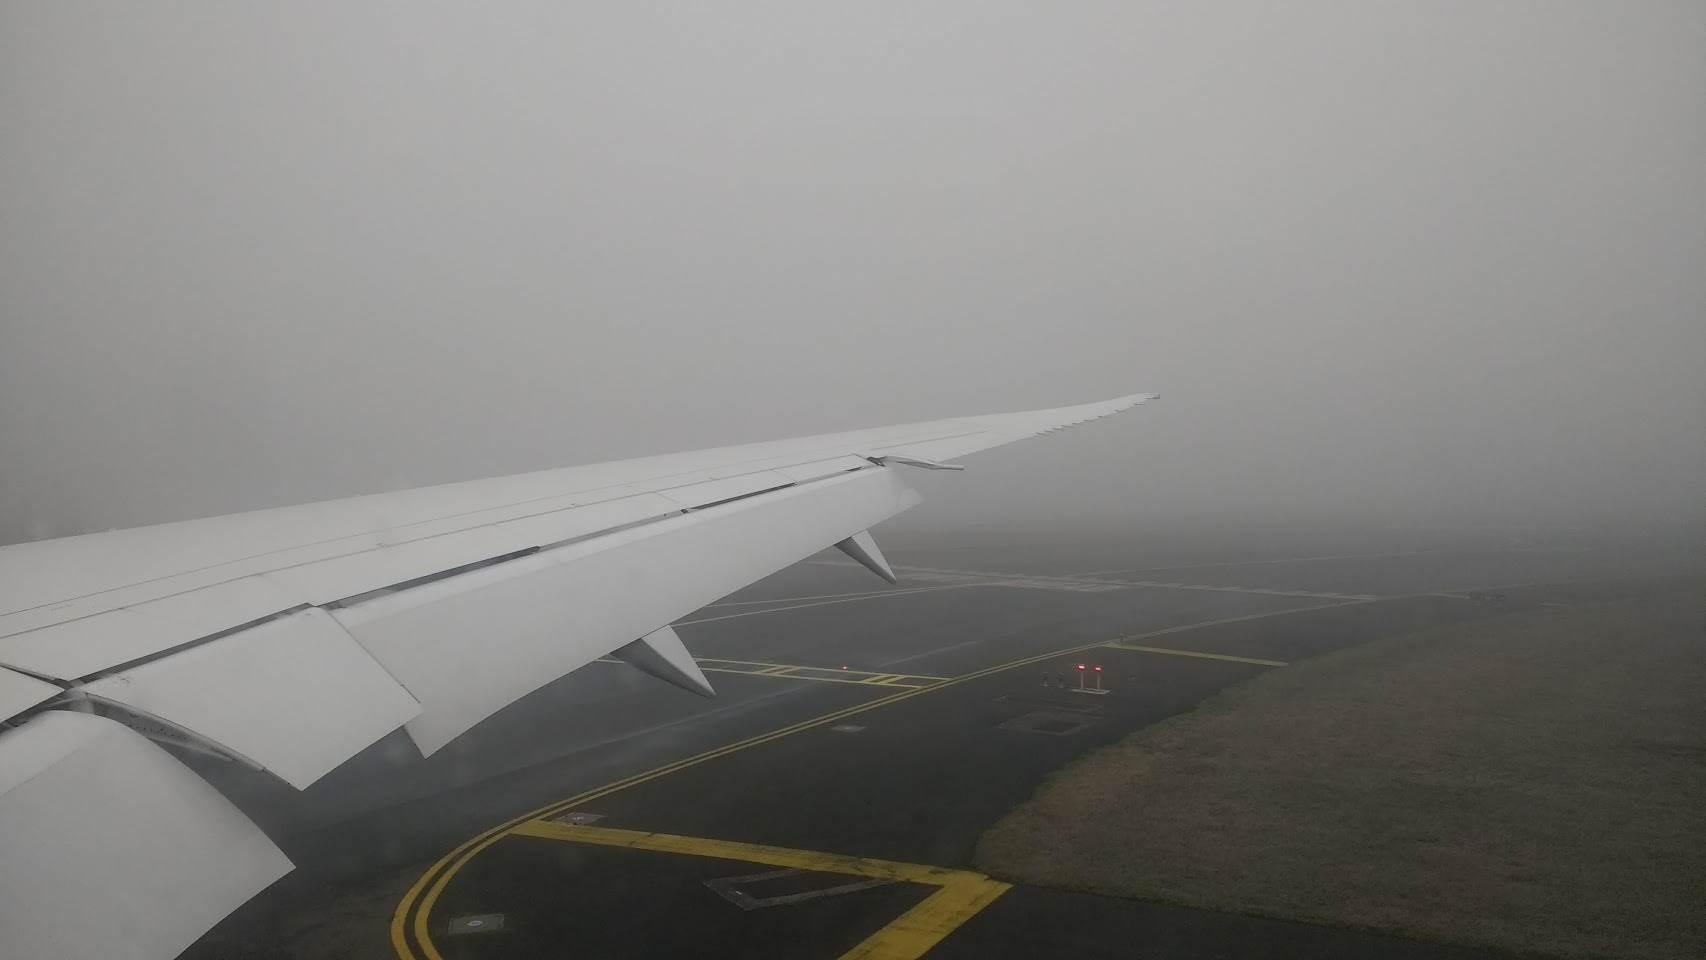 Aviation Jobs Us Virgin Islands